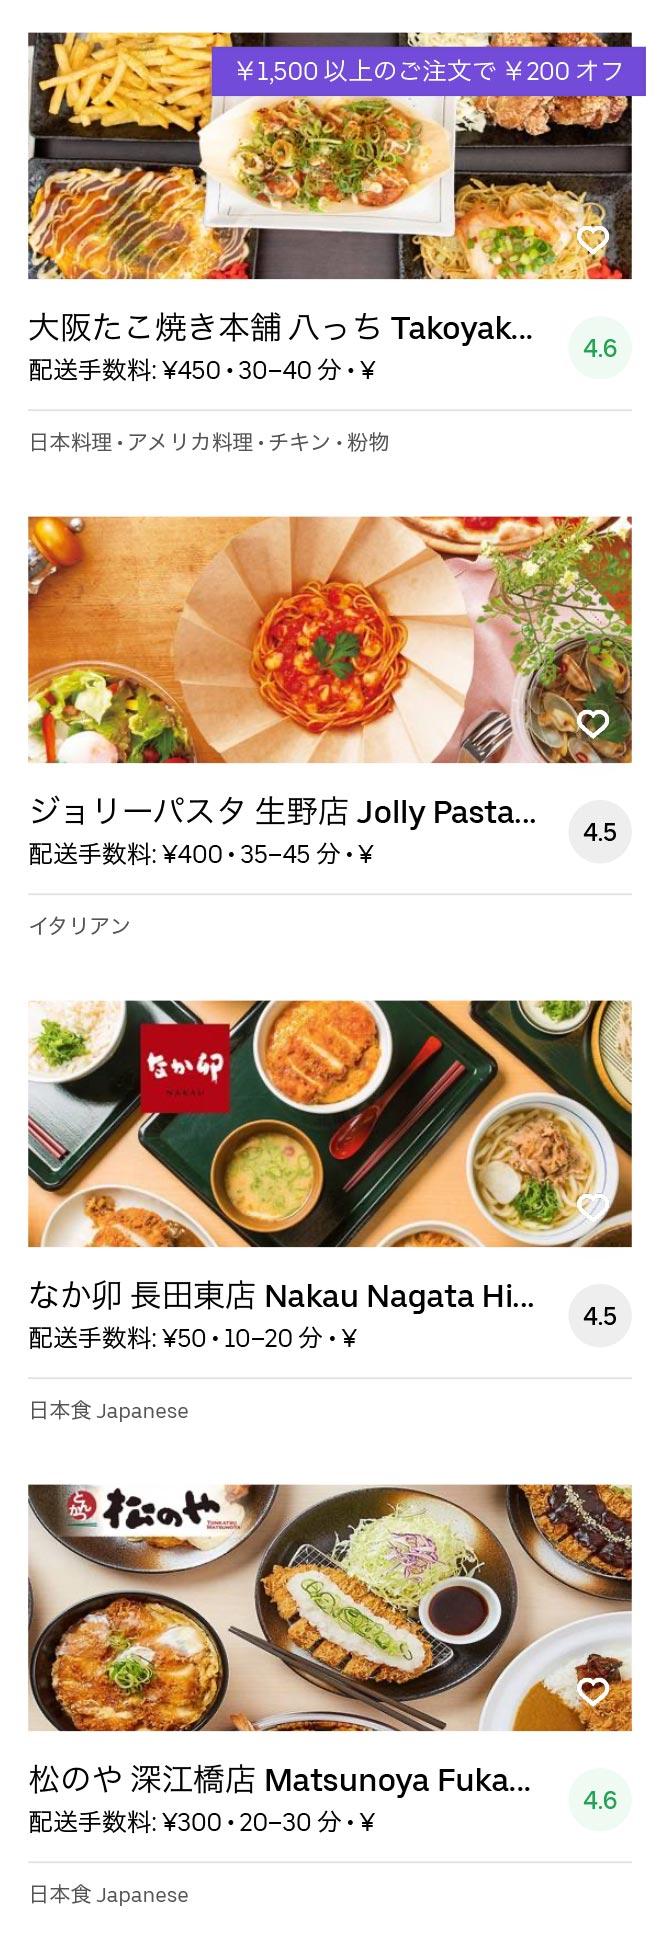 Higashi osaka nagata menu 2005 09